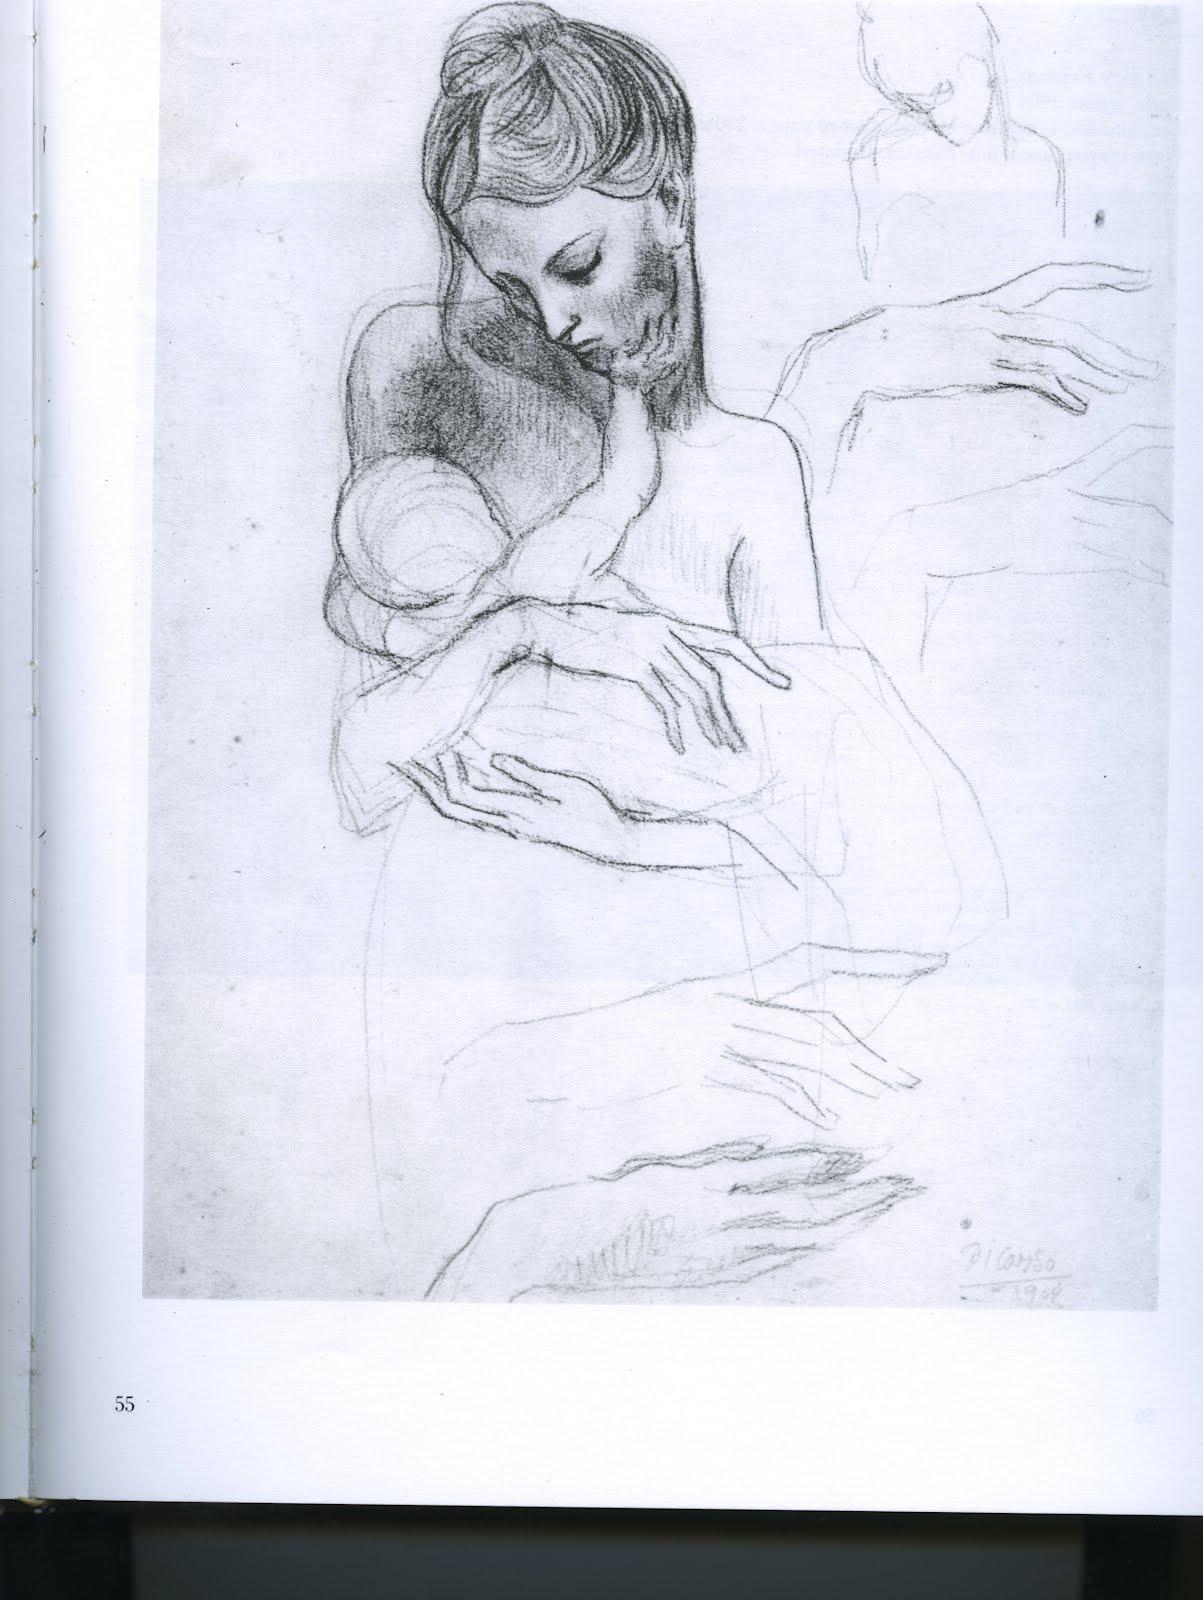 pablo picasso sketches - photo #5